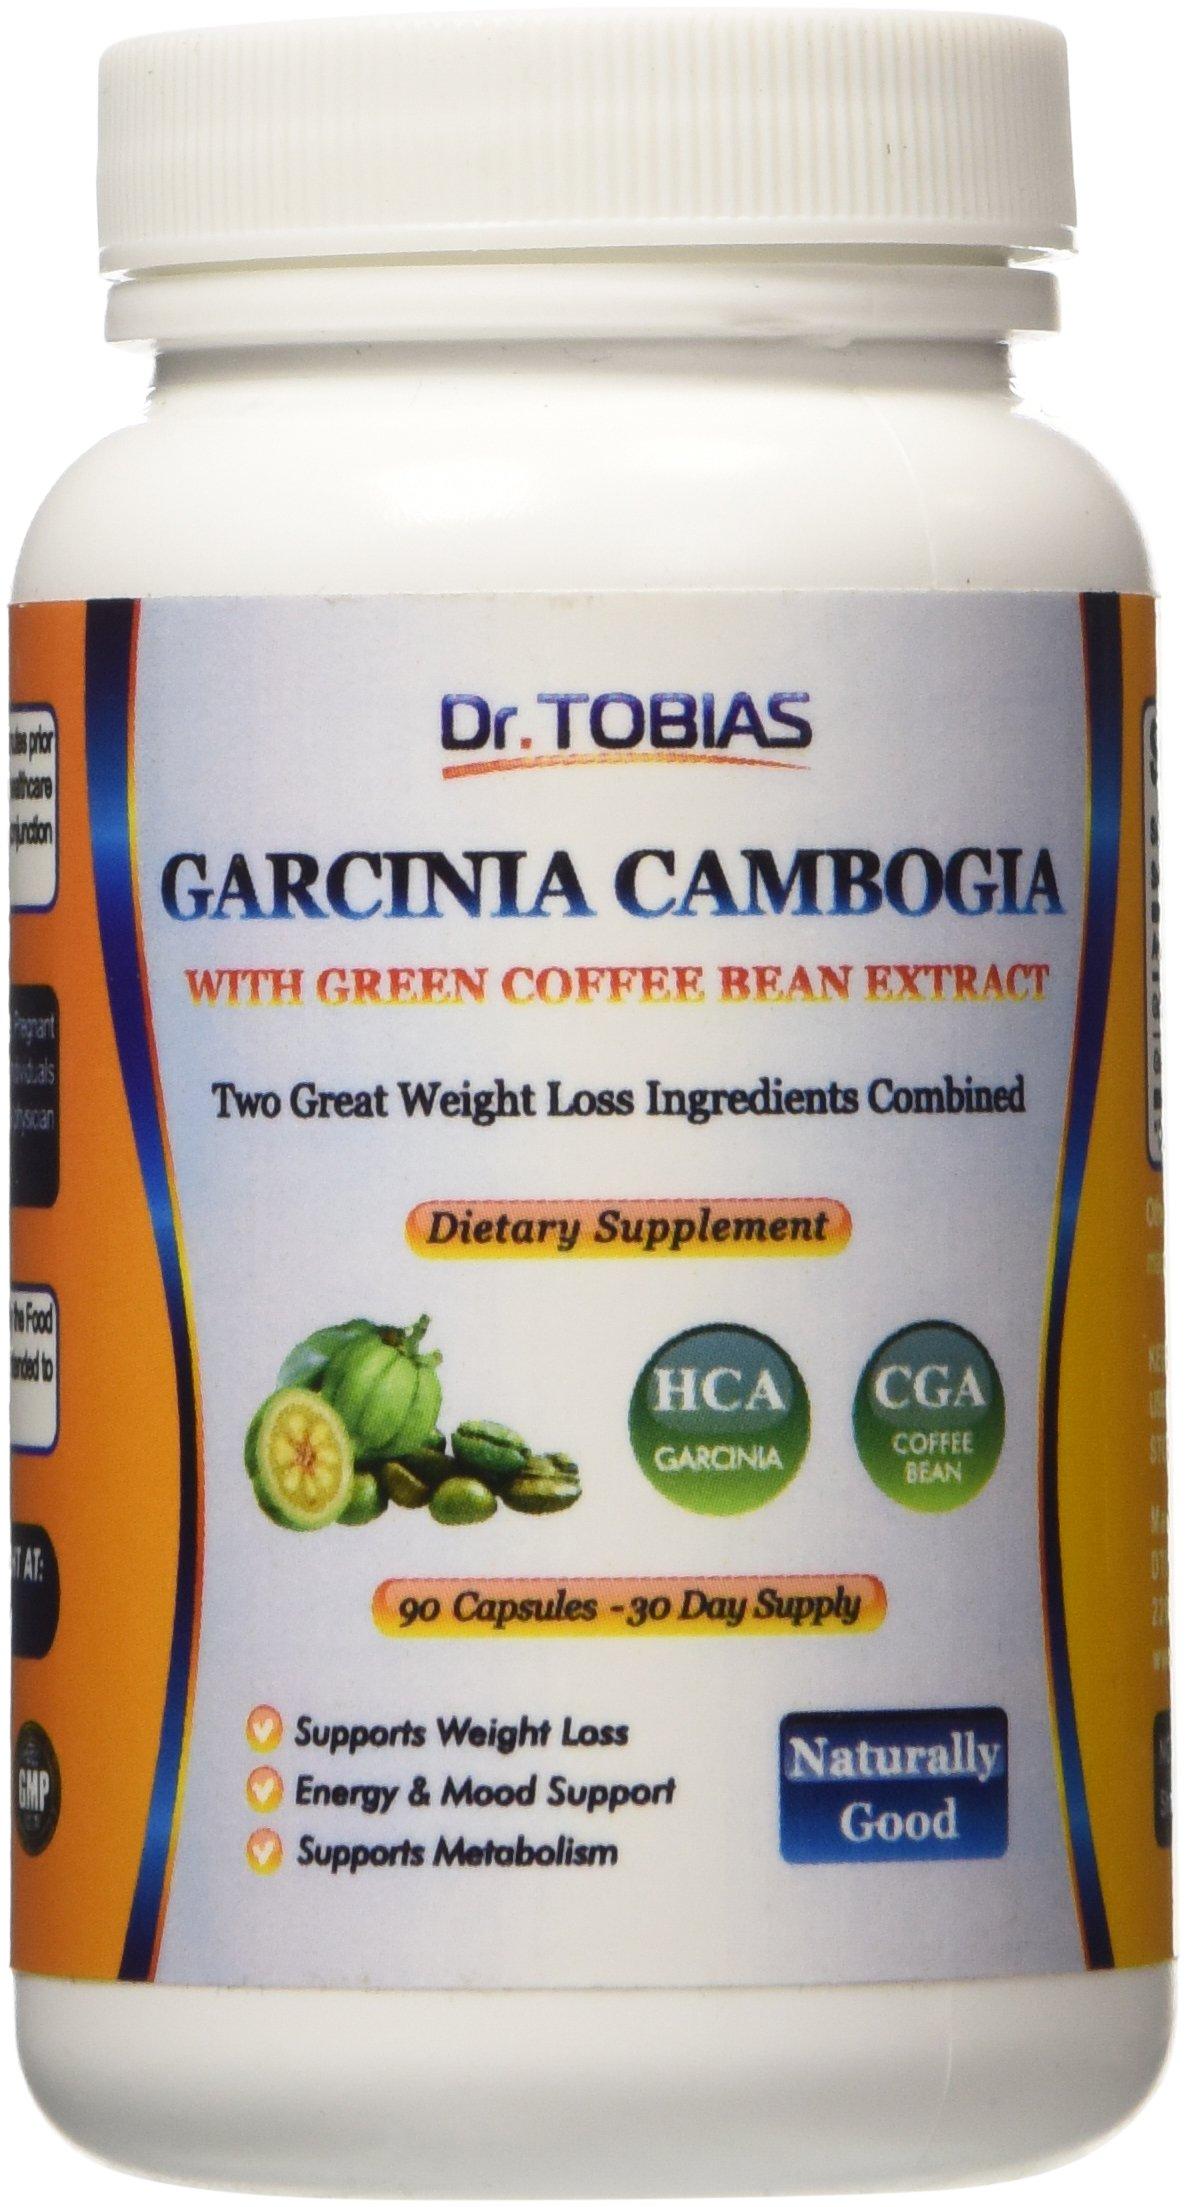 New dr tobias fish oil omega 3 optimum 60 capsules plus for Dr tobias fish oil